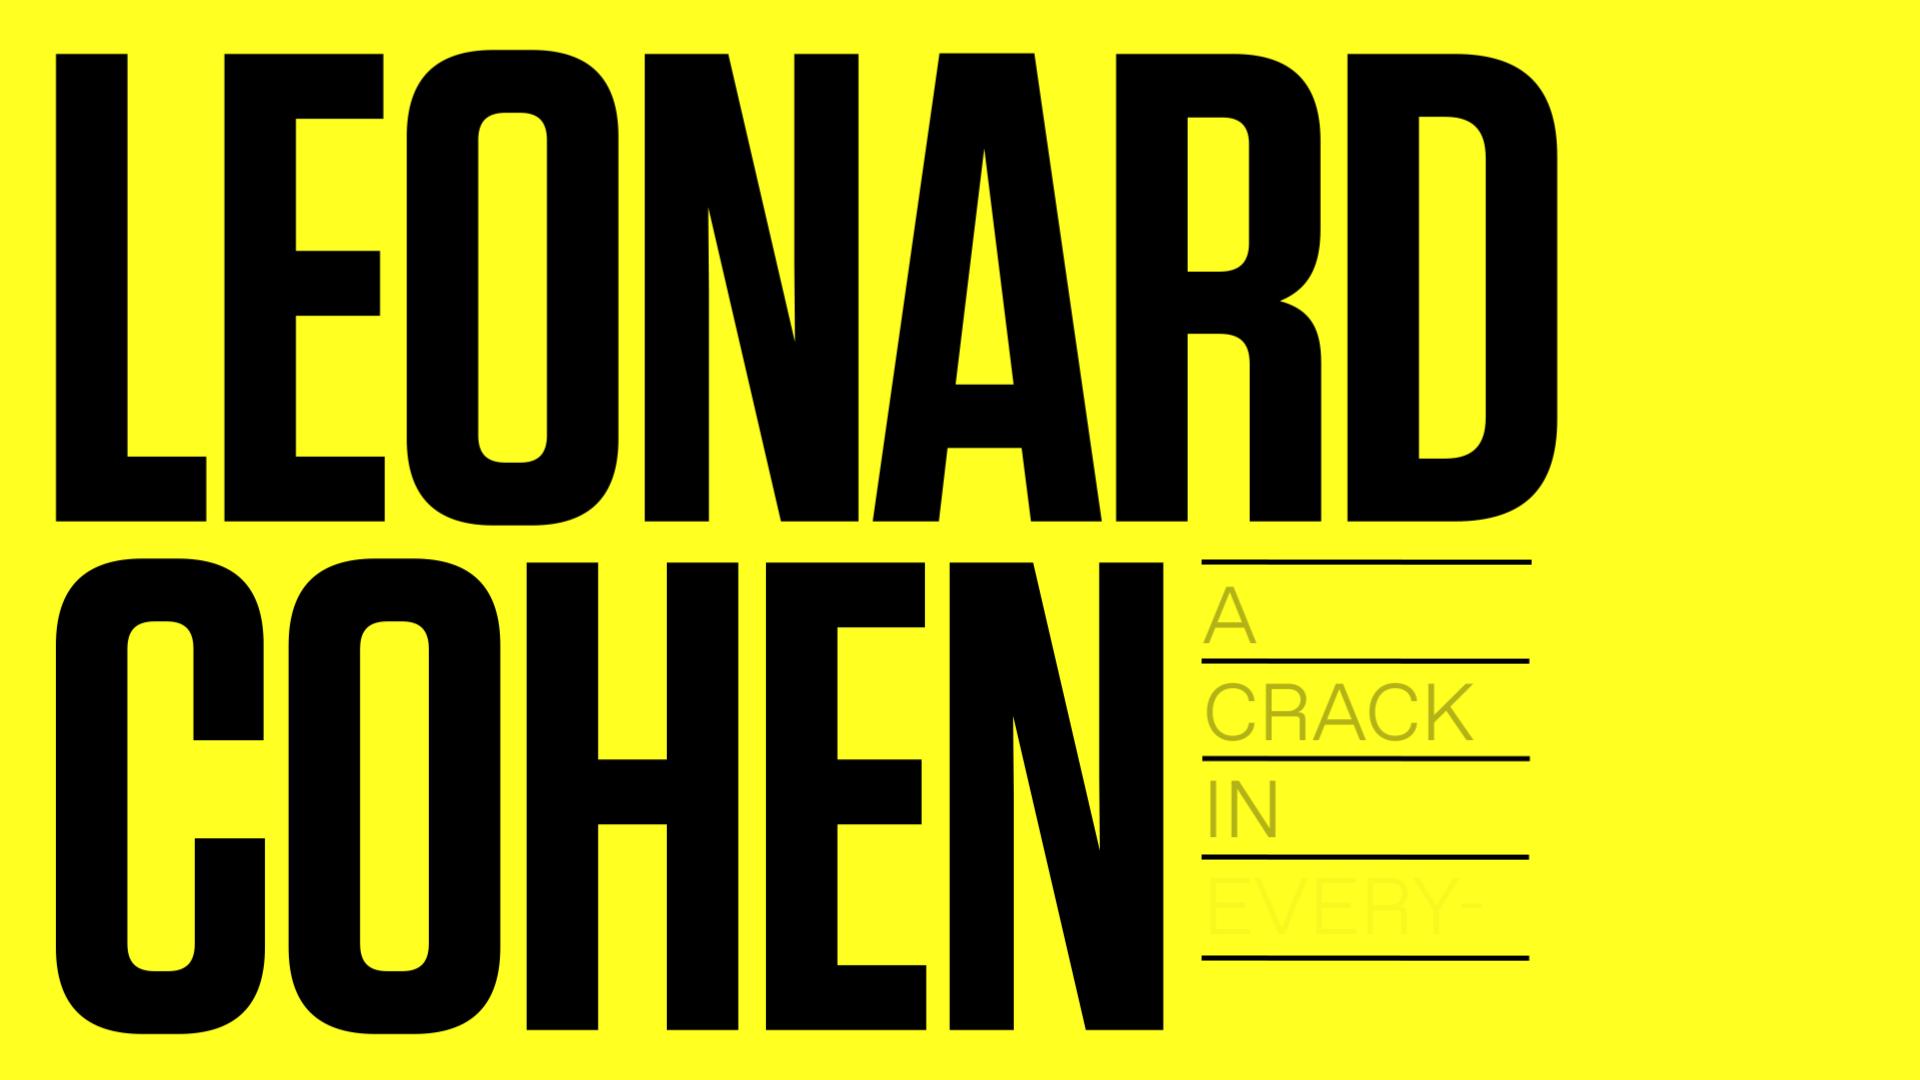 JM_CZimmerman_Leonard-Cohen_1